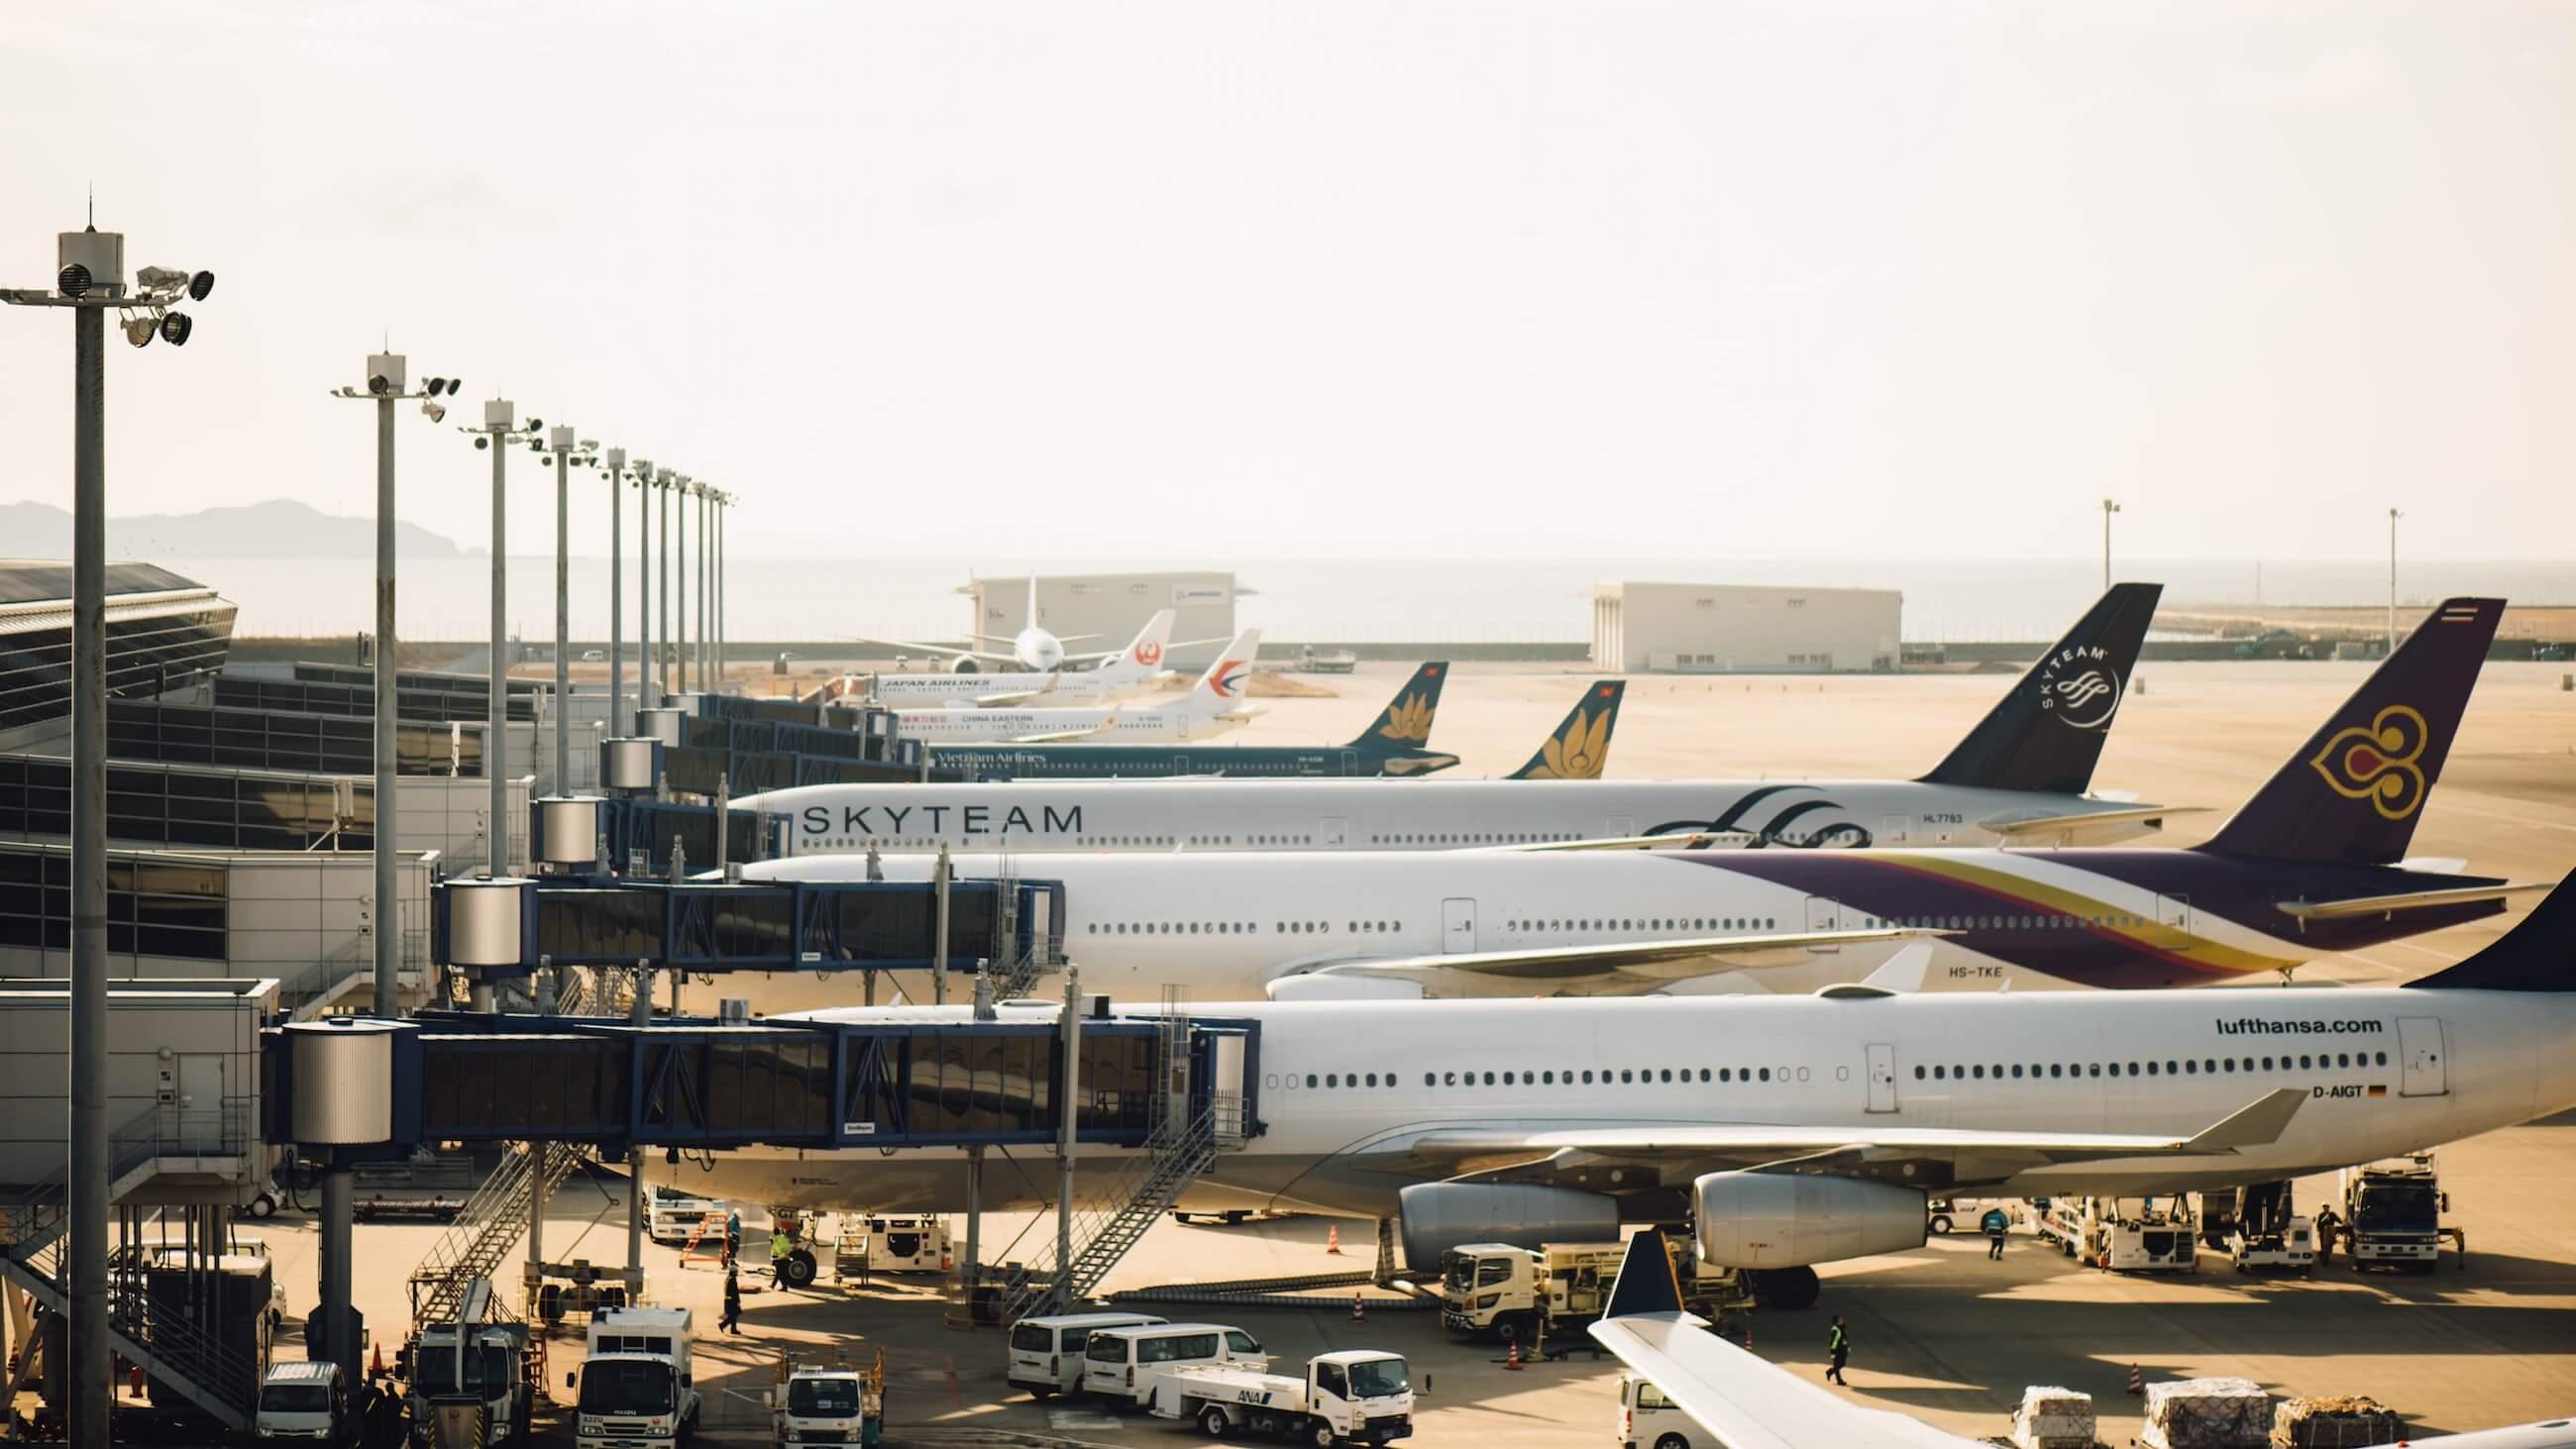 туризм блокчейн самолет аэропорт